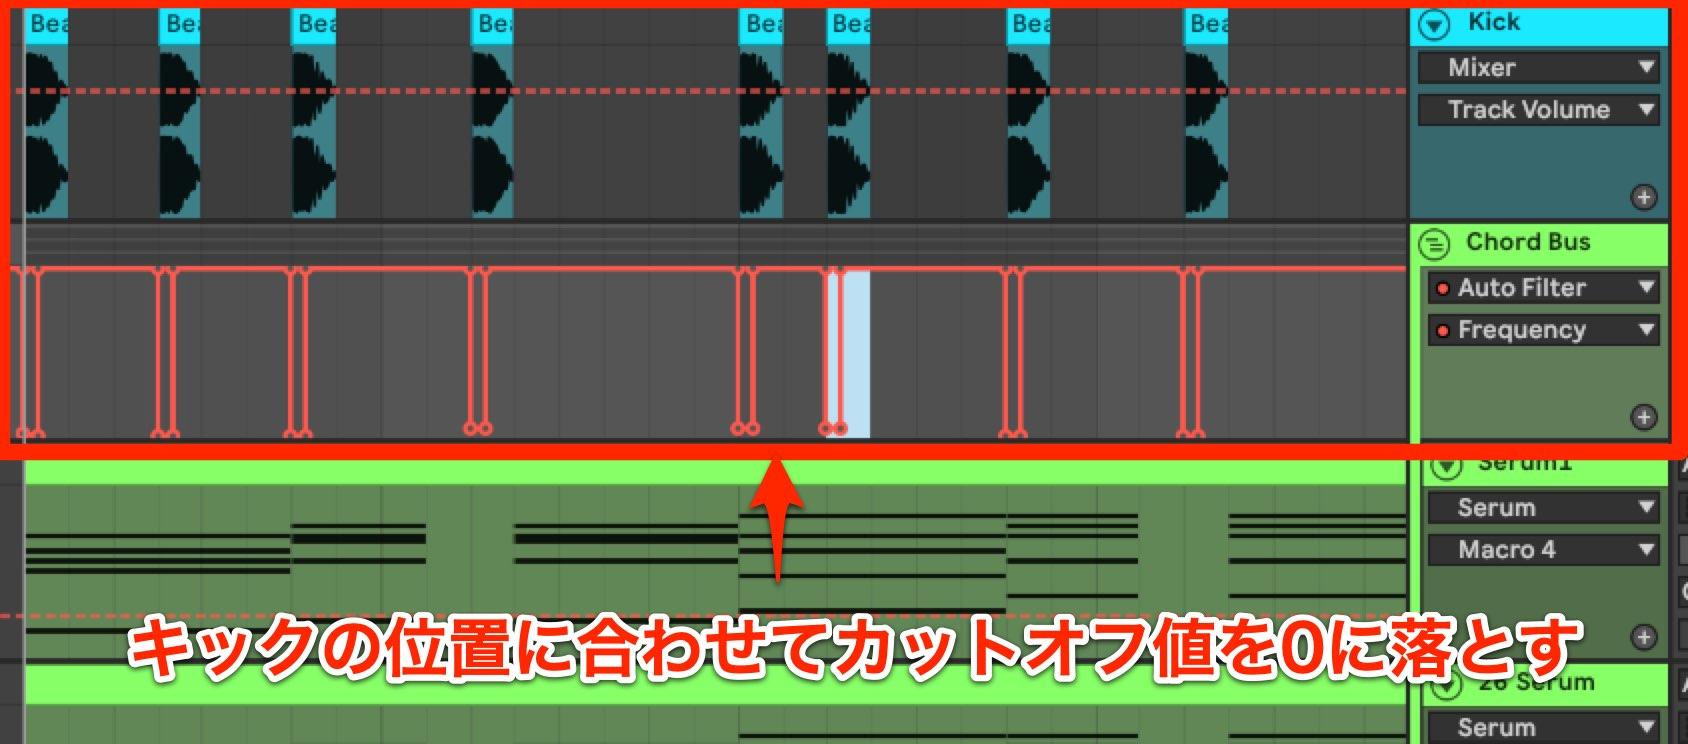 Future Bass コード LPF3